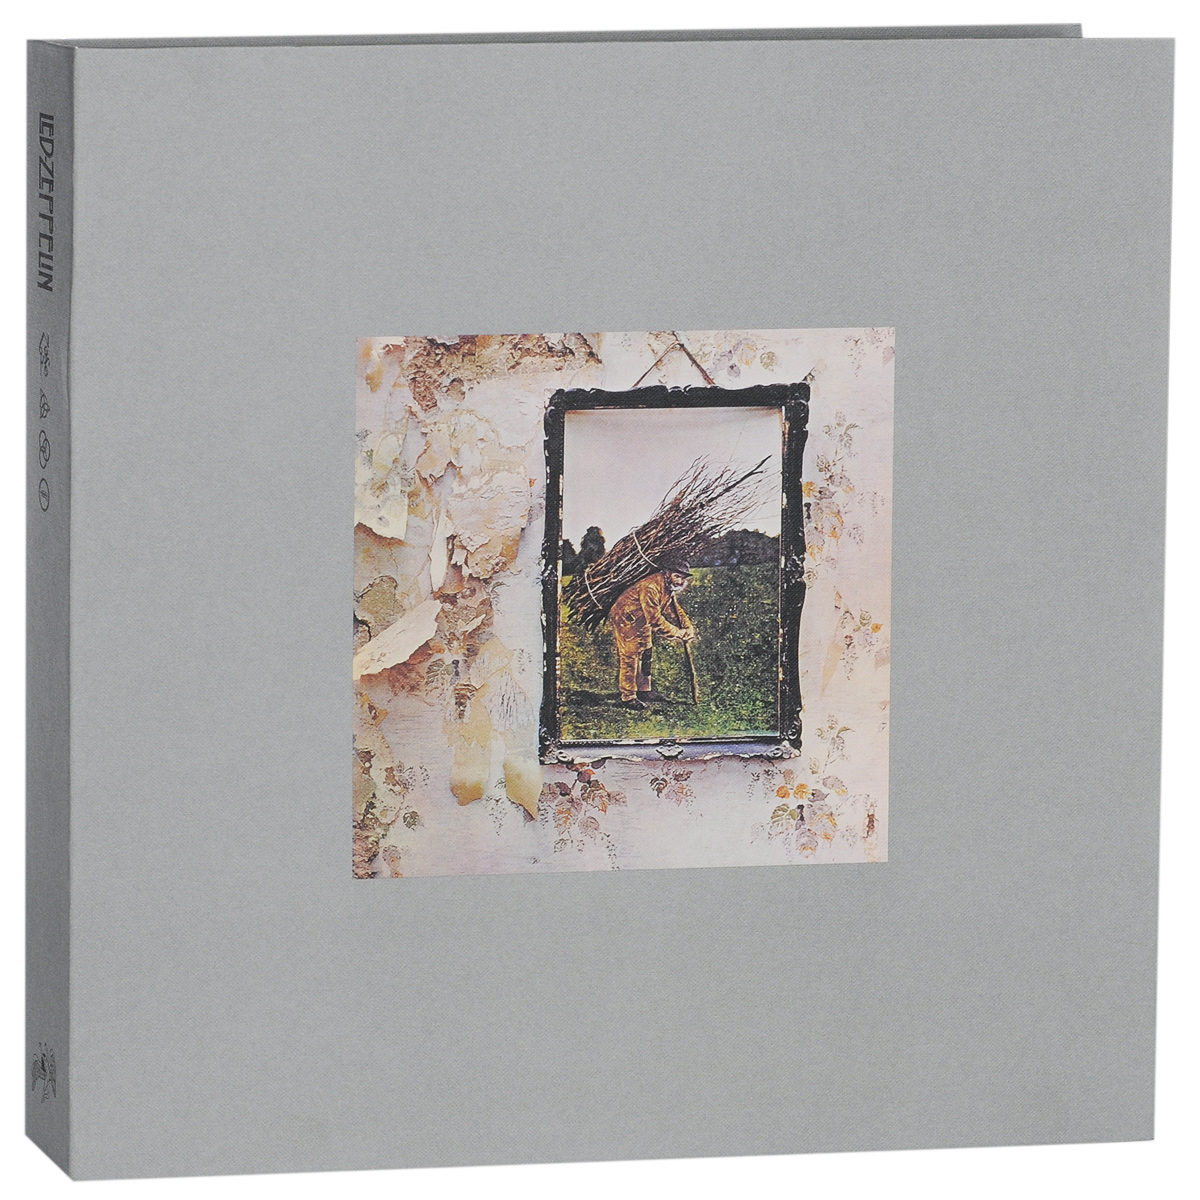 """Led Zeppelin"" Led Zeppelin. IV. Super Deluxe Edition (2 LP + 2 CD)"